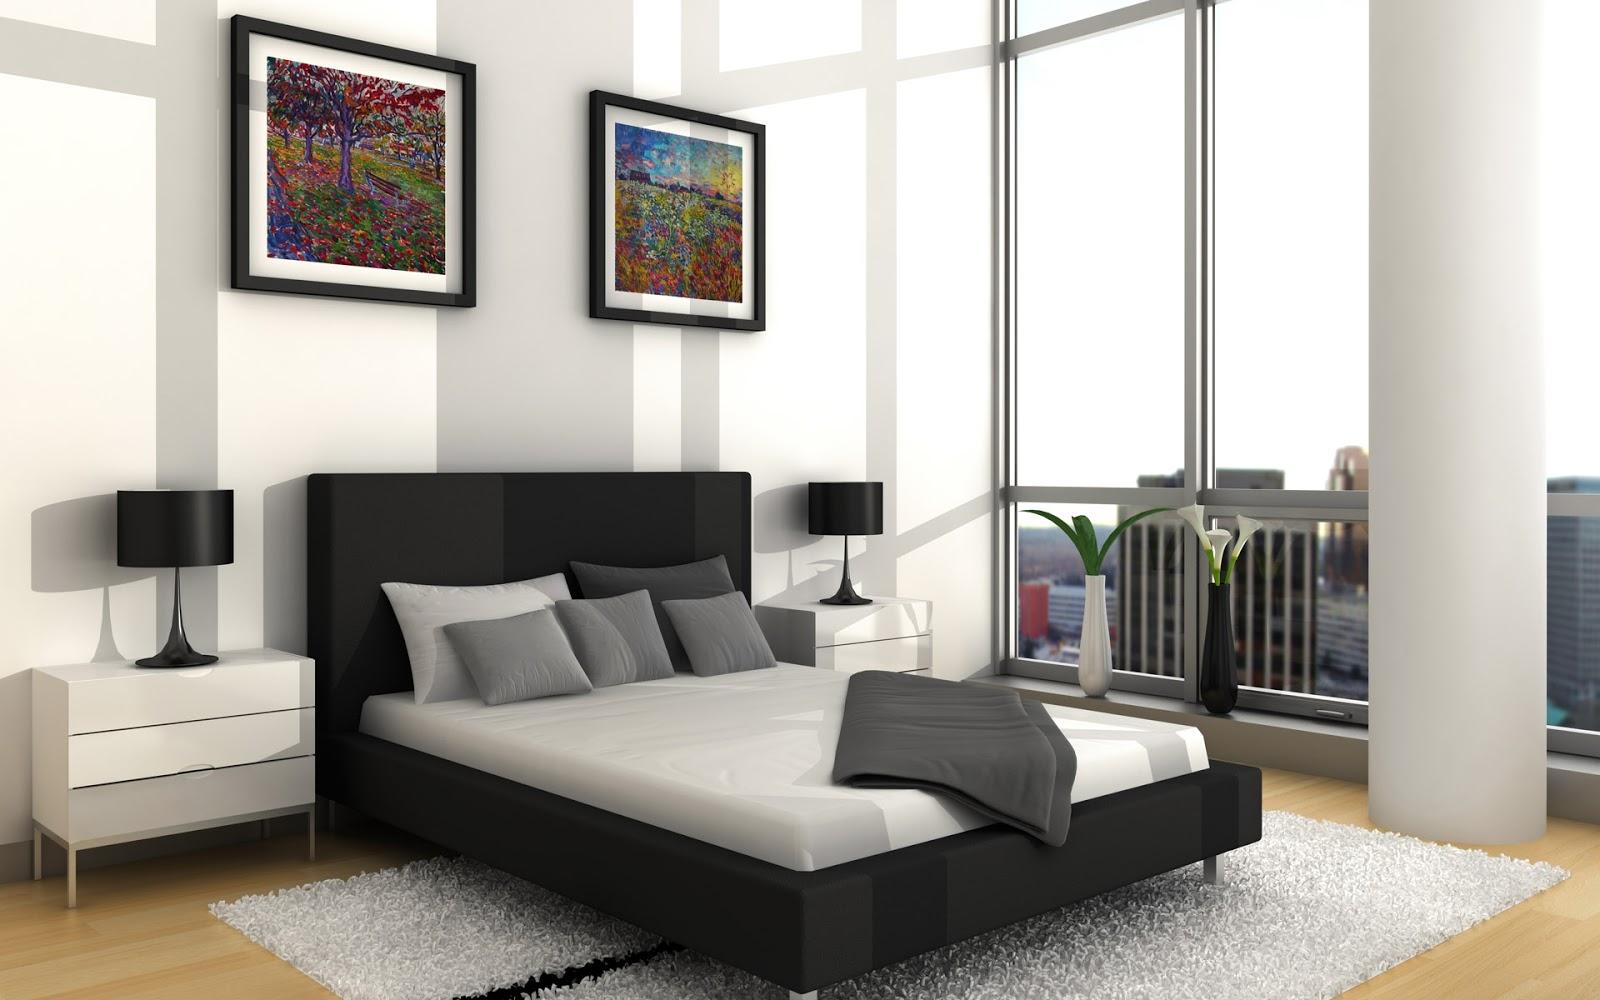 ... interior design iii bedroom interior design iv tv room interior design